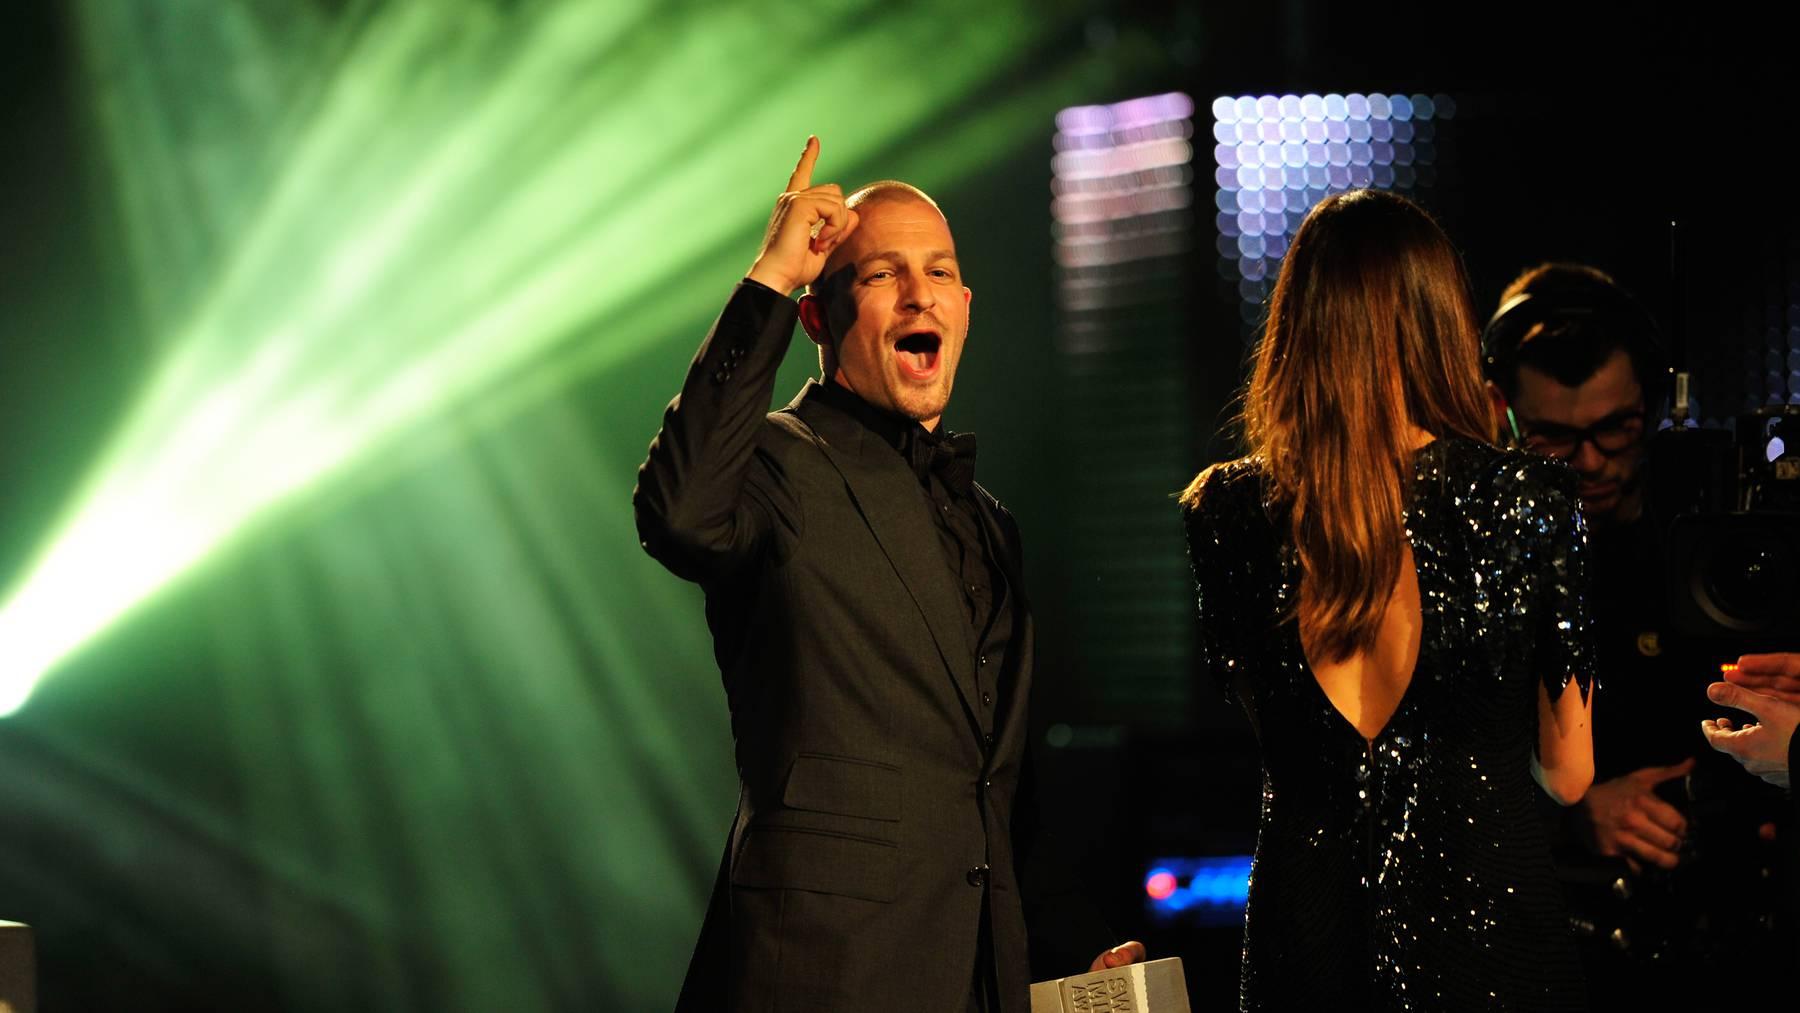 Radio Pilatus und Tele 1 an den Swiss Music Awards